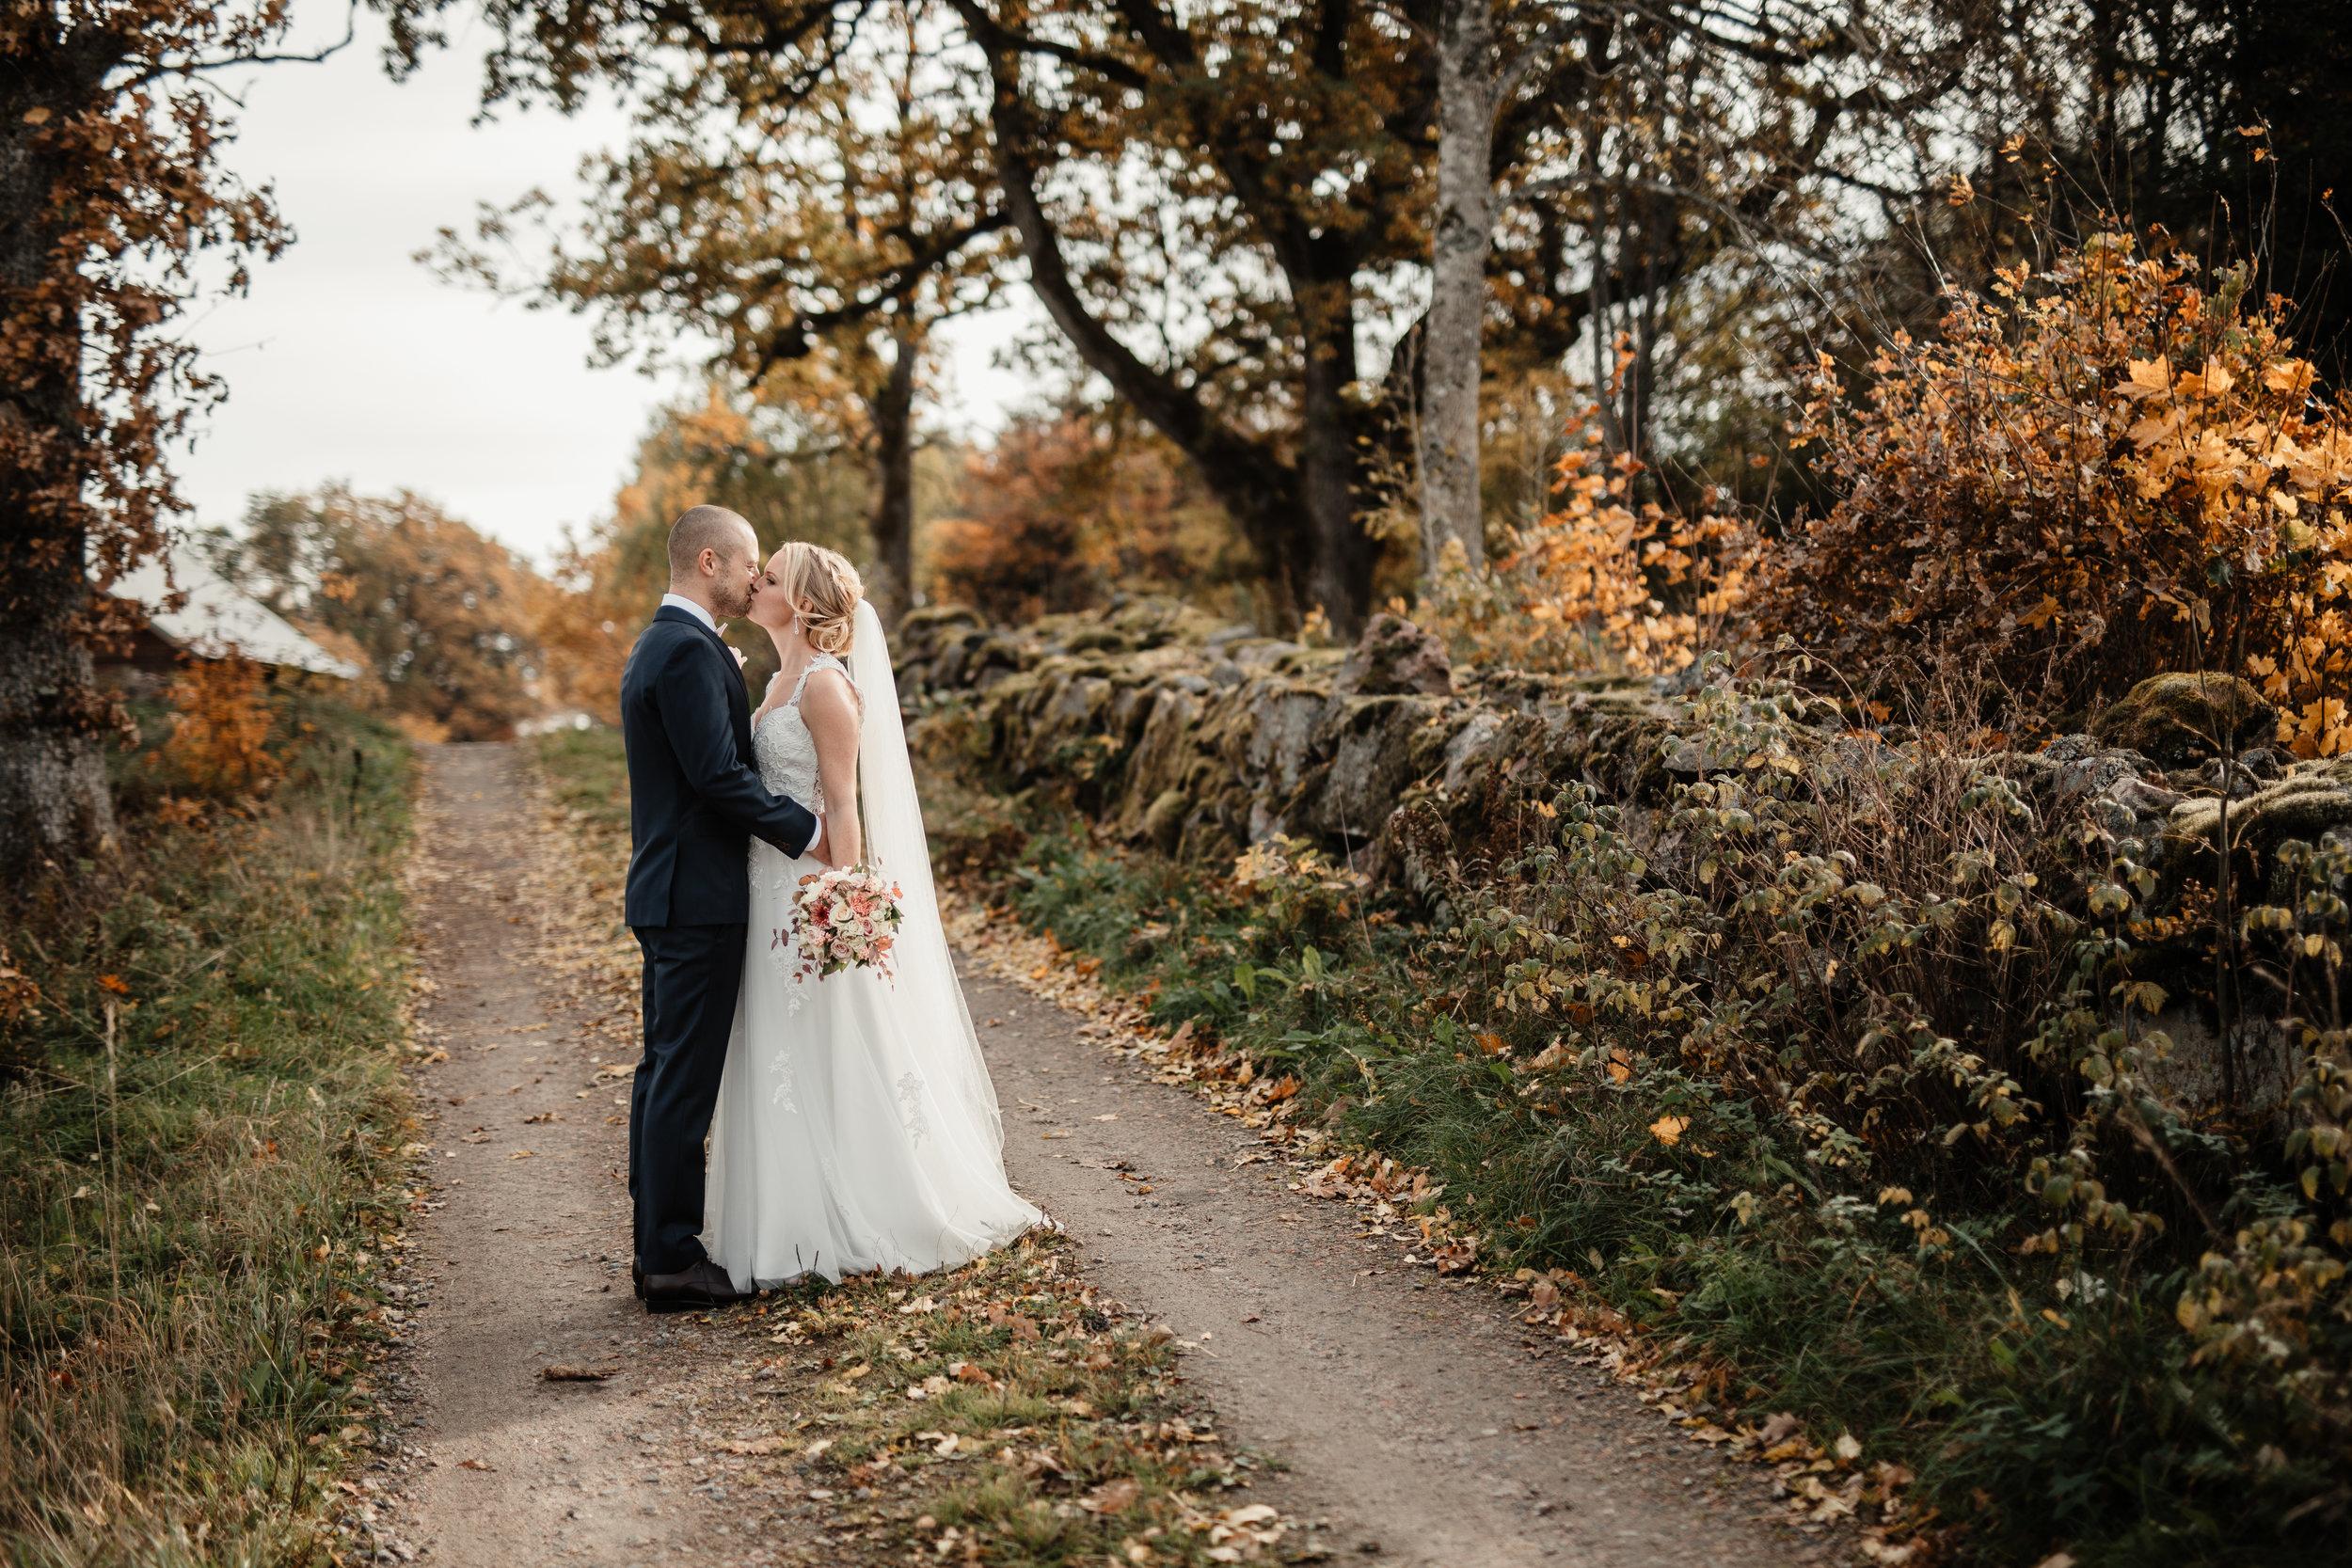 Bröllopsfotograf-Uddetorp Säteri-Höstbröllop-Fotograf Emilia- Bröllopsfotograf Borås-19.jpg